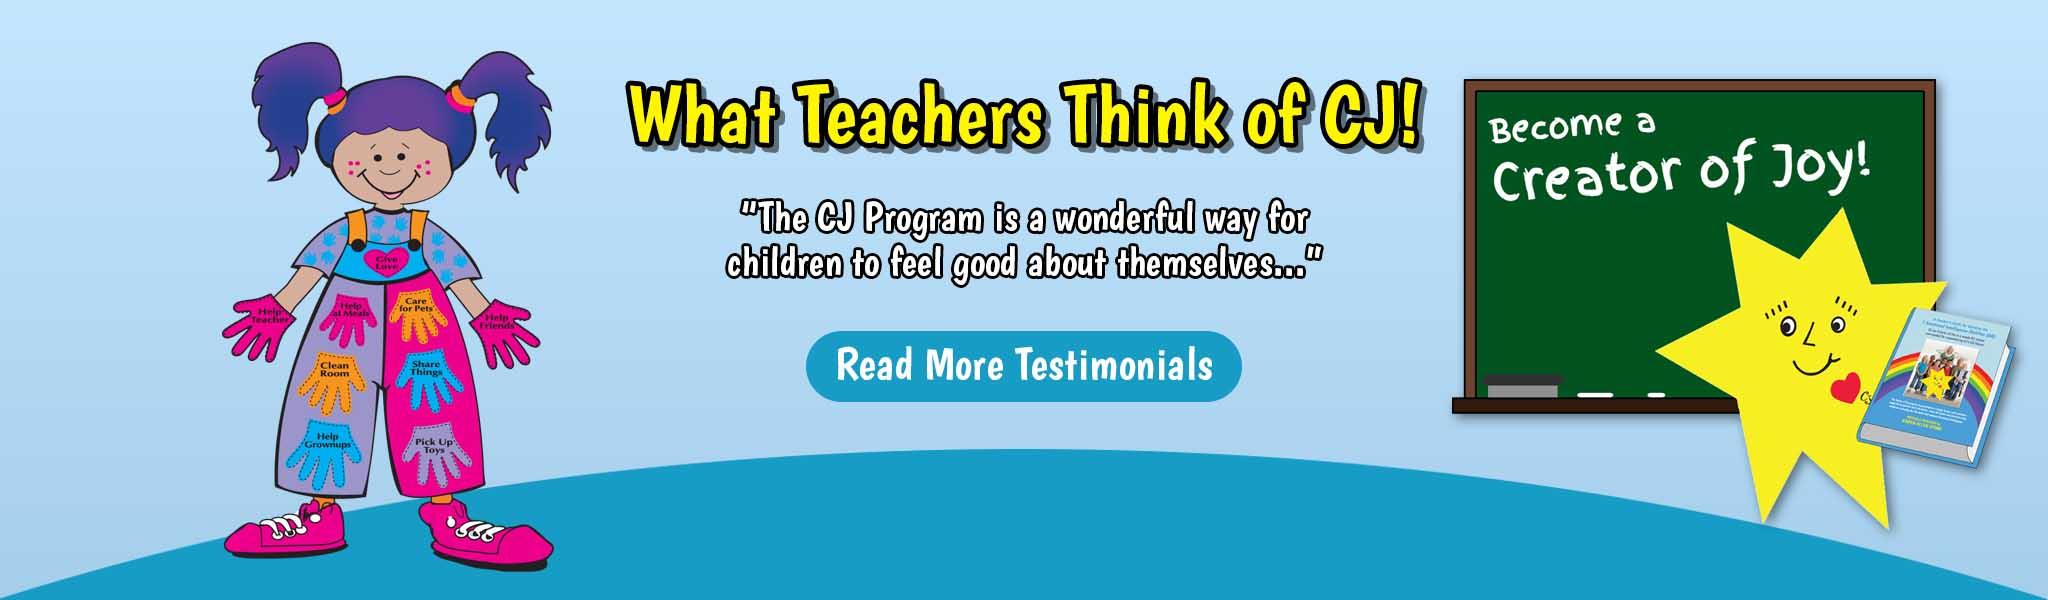 What Teachers Think of CJ - Banner